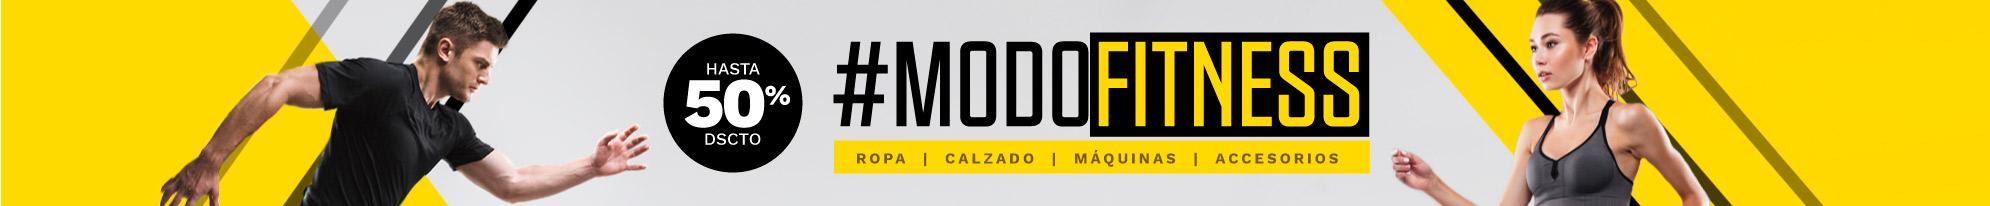 Banner principal Modo Fitness